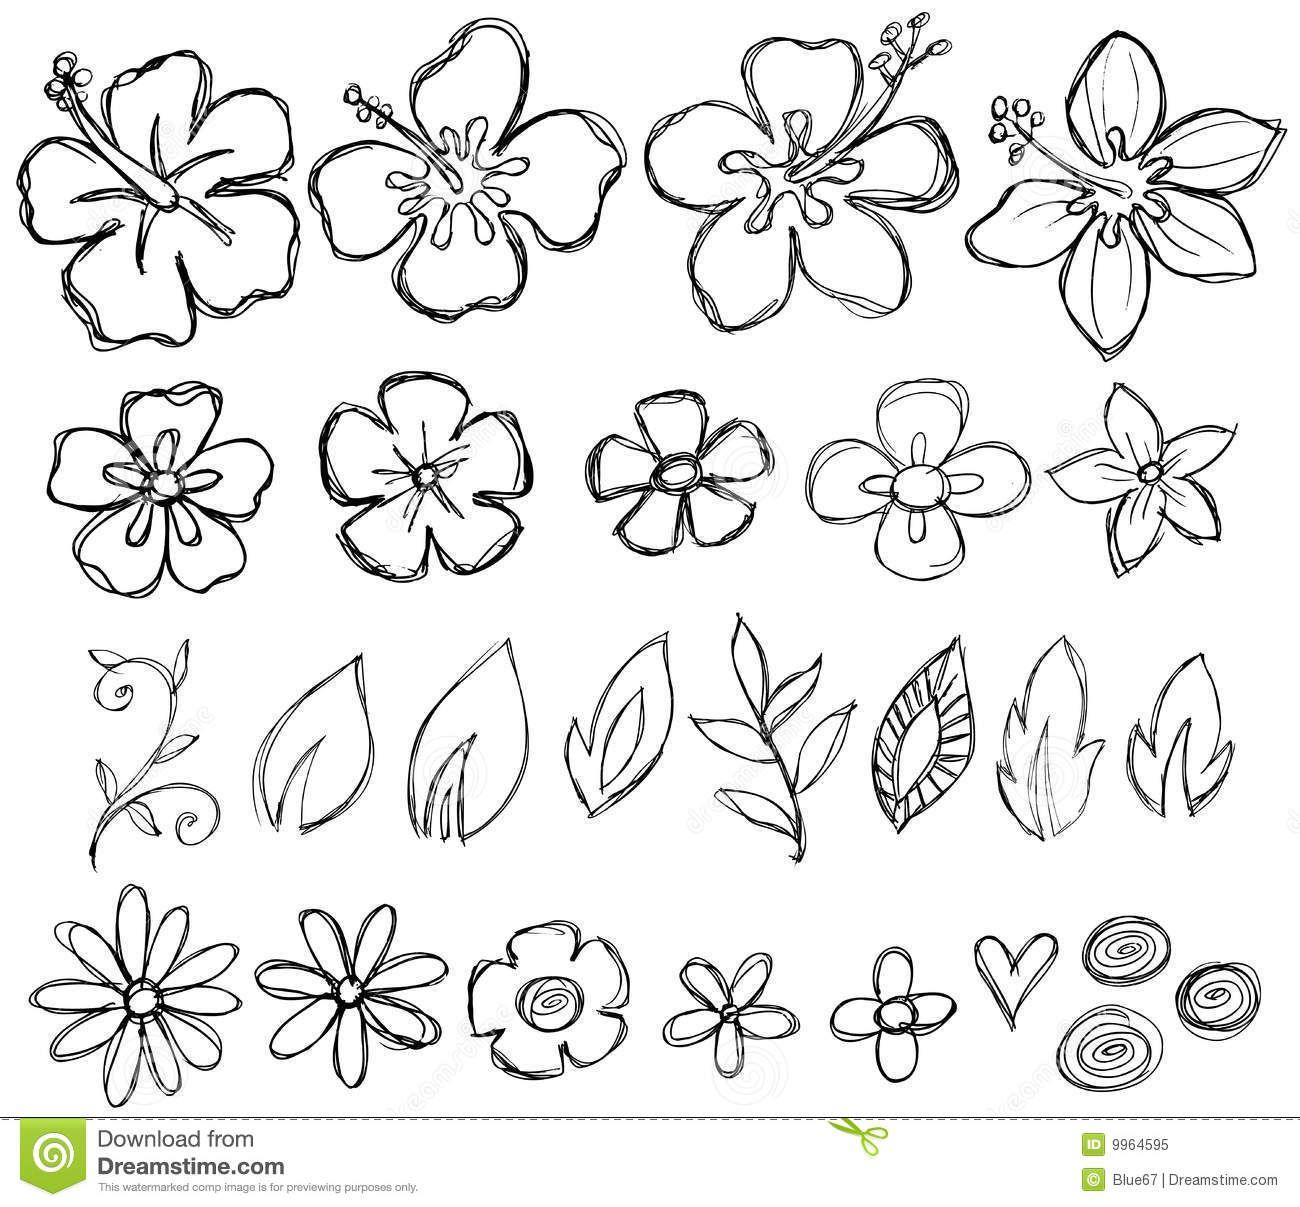 Illustration About Sketchy Doodle Tropical Flowers Leaves Vector Illustration Illustration Of Hawaiian Bea Flower Doodles Flower Drawing Doodle Art Flowers